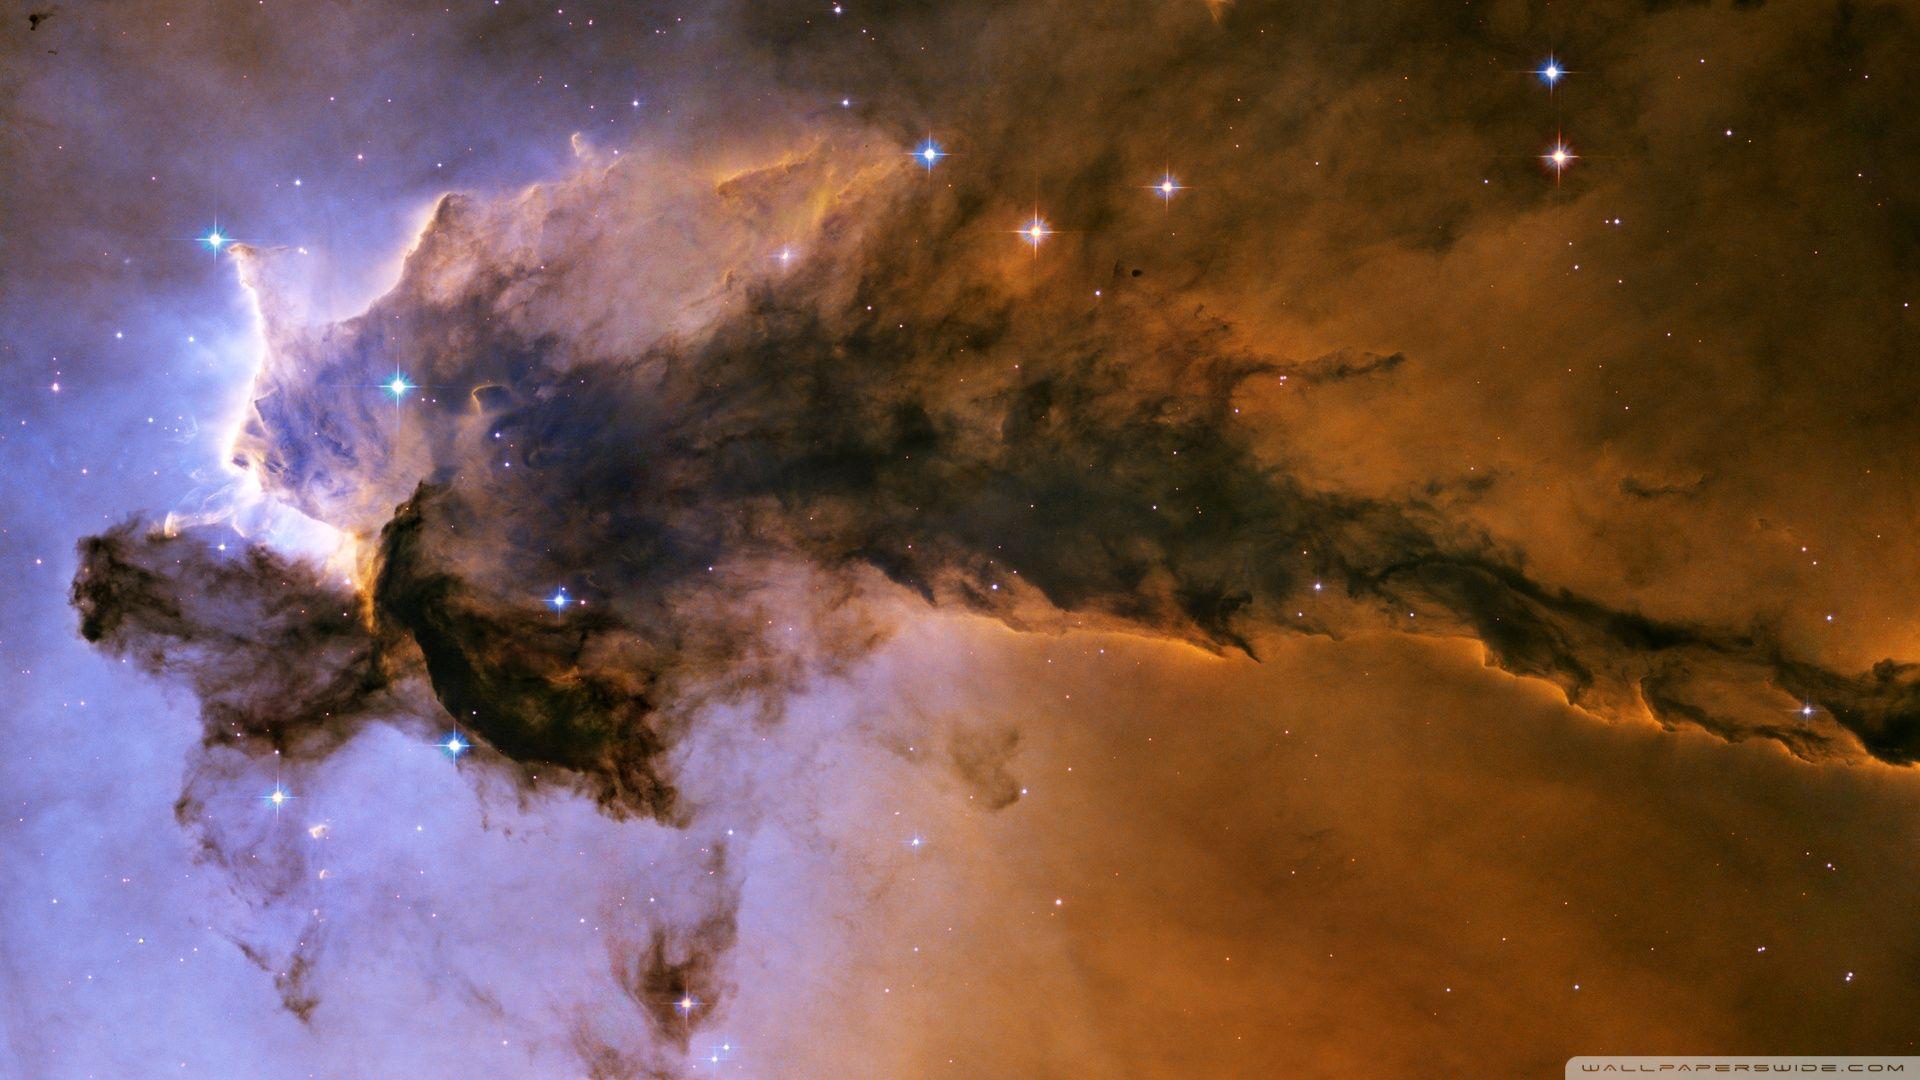 Beautiful Wallpaper High Resolution Nebula - 1df0607bc4ce917866b249777e281d06  HD_55426.jpg